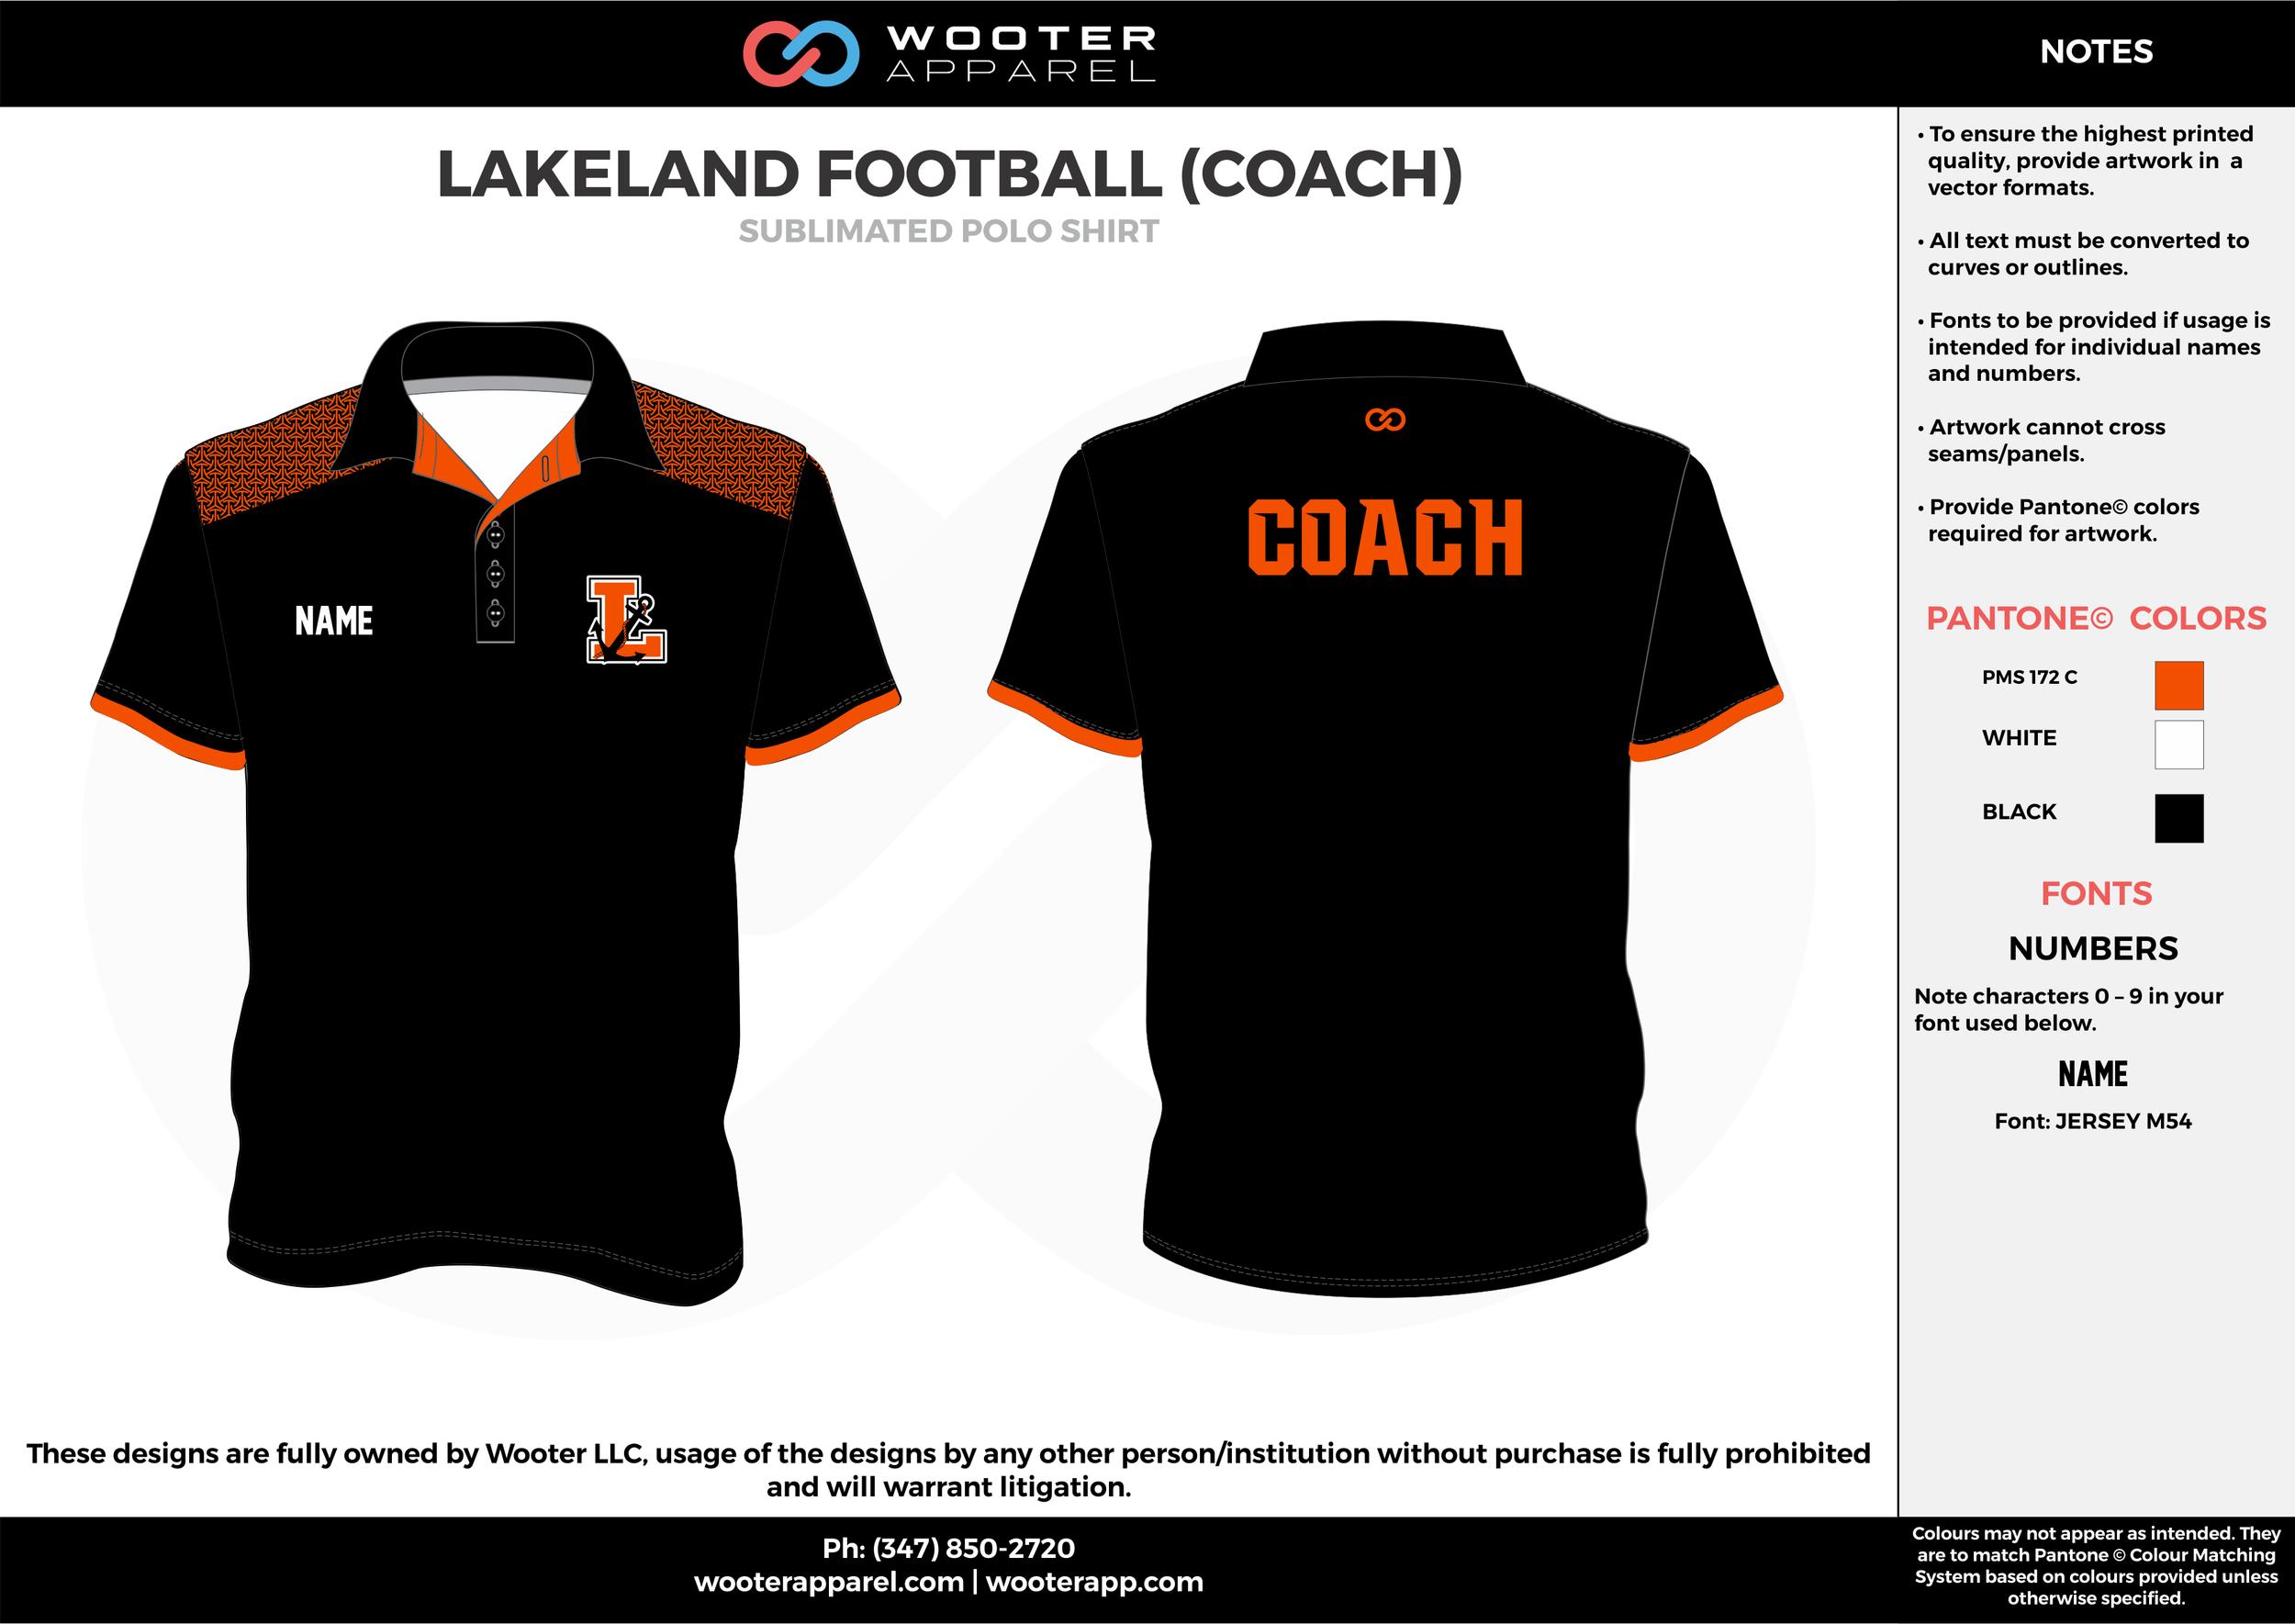 LAKELAND FOOTBALL (COACH) orange black white Polo Shirts